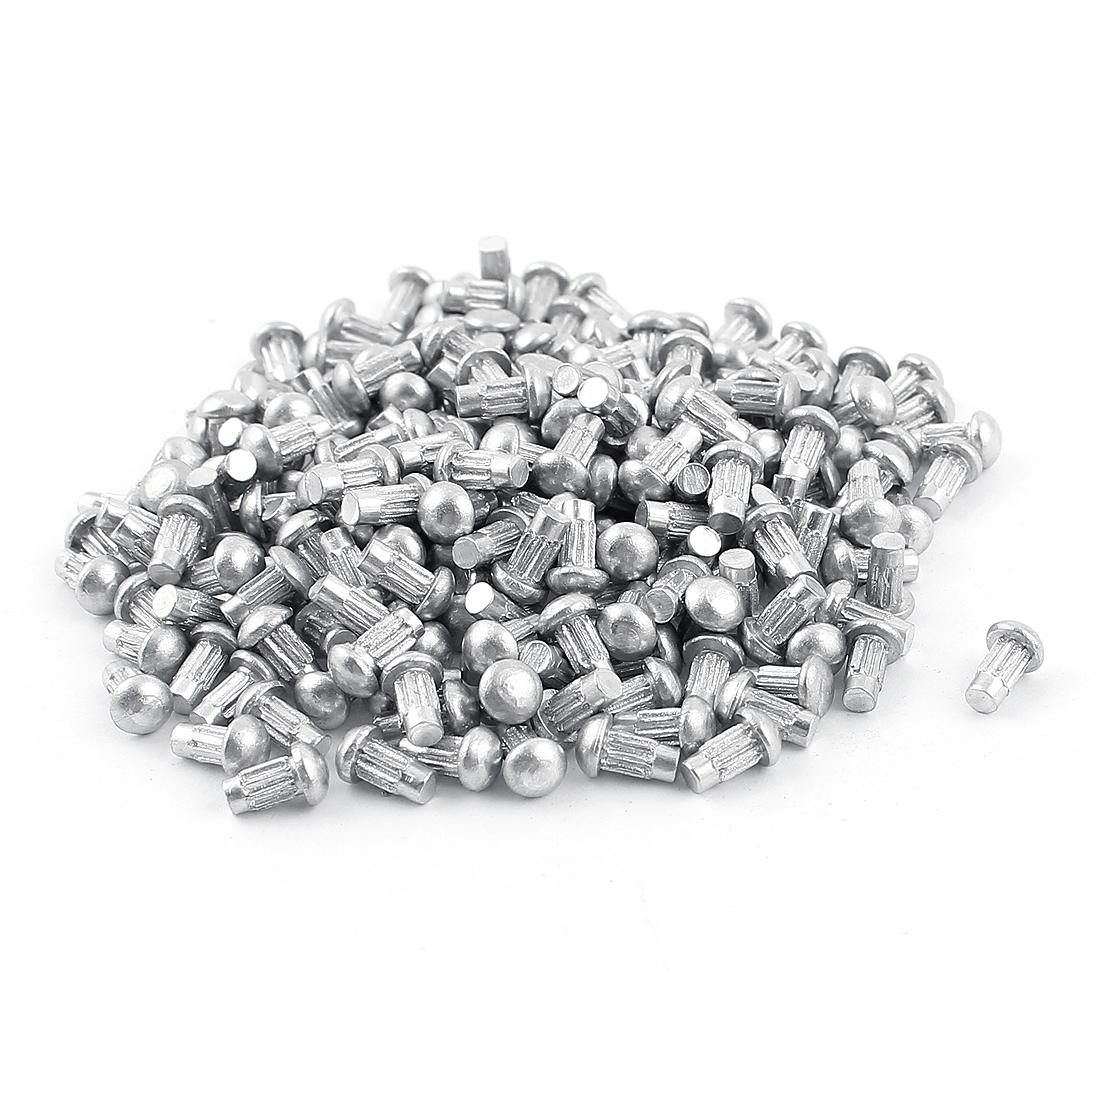 "200 Pcs 3/32"" x 13/64"" Aluminium Round Head Solid Rivets Knurled Shanks"